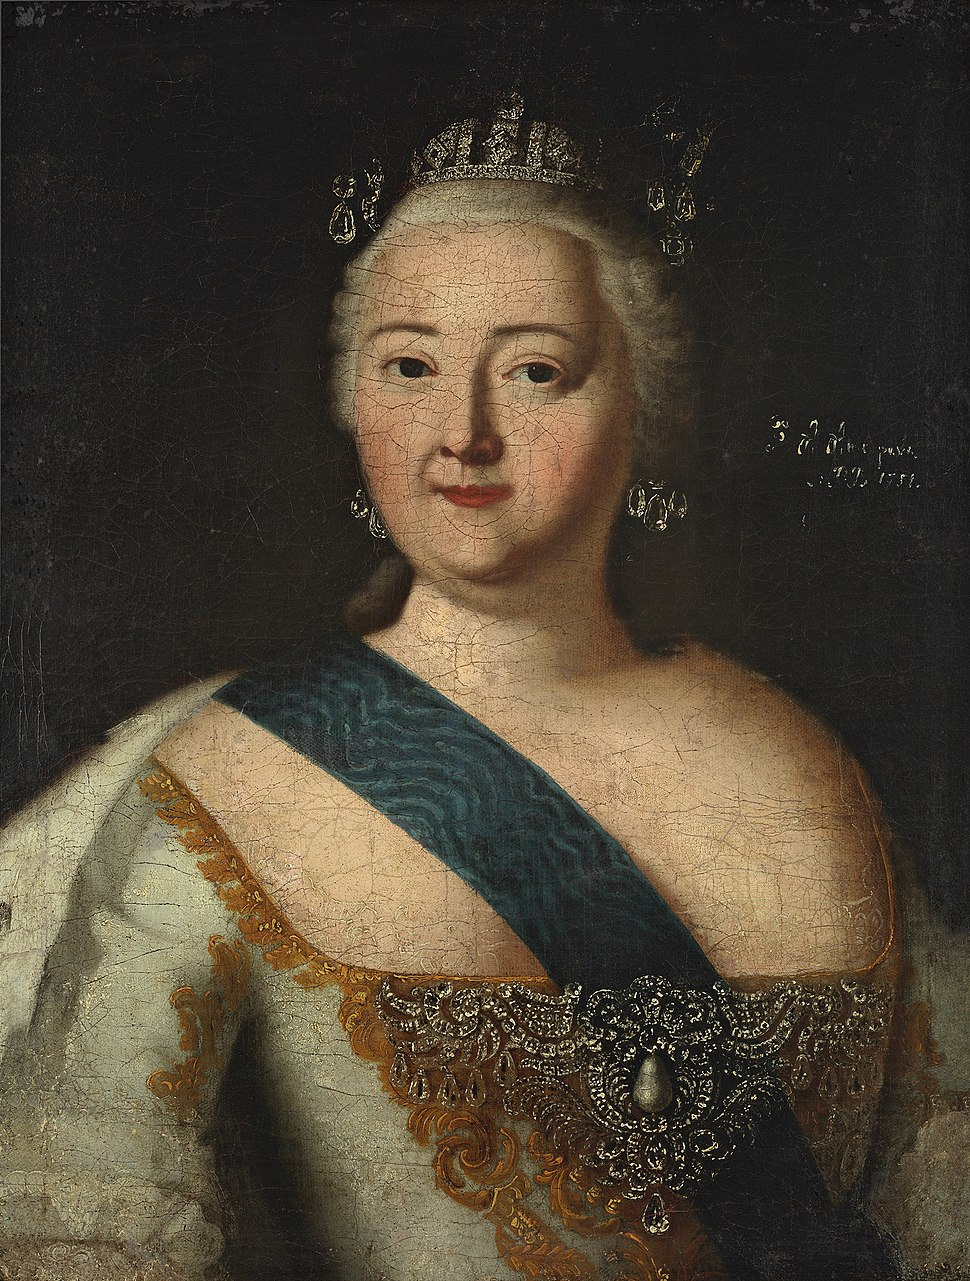 Elizabeth of Russia by A.Antropov (1751, Tretyakov gallery)